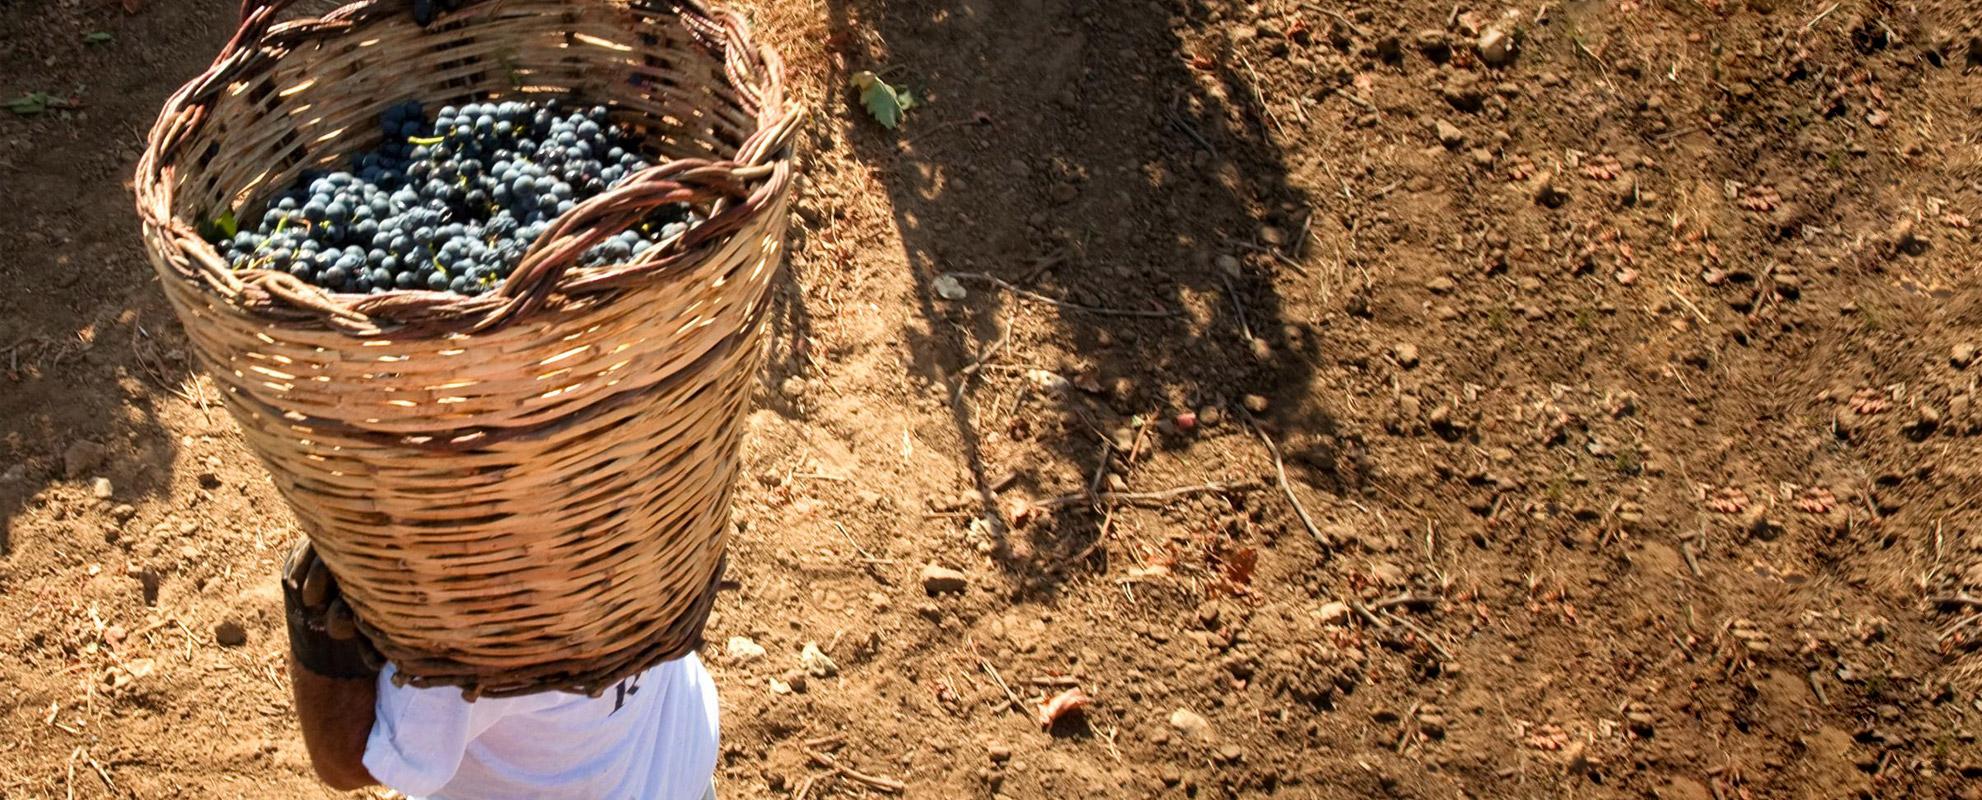 TR Punta Aquila - Tenute Rubino | Vini del Salento